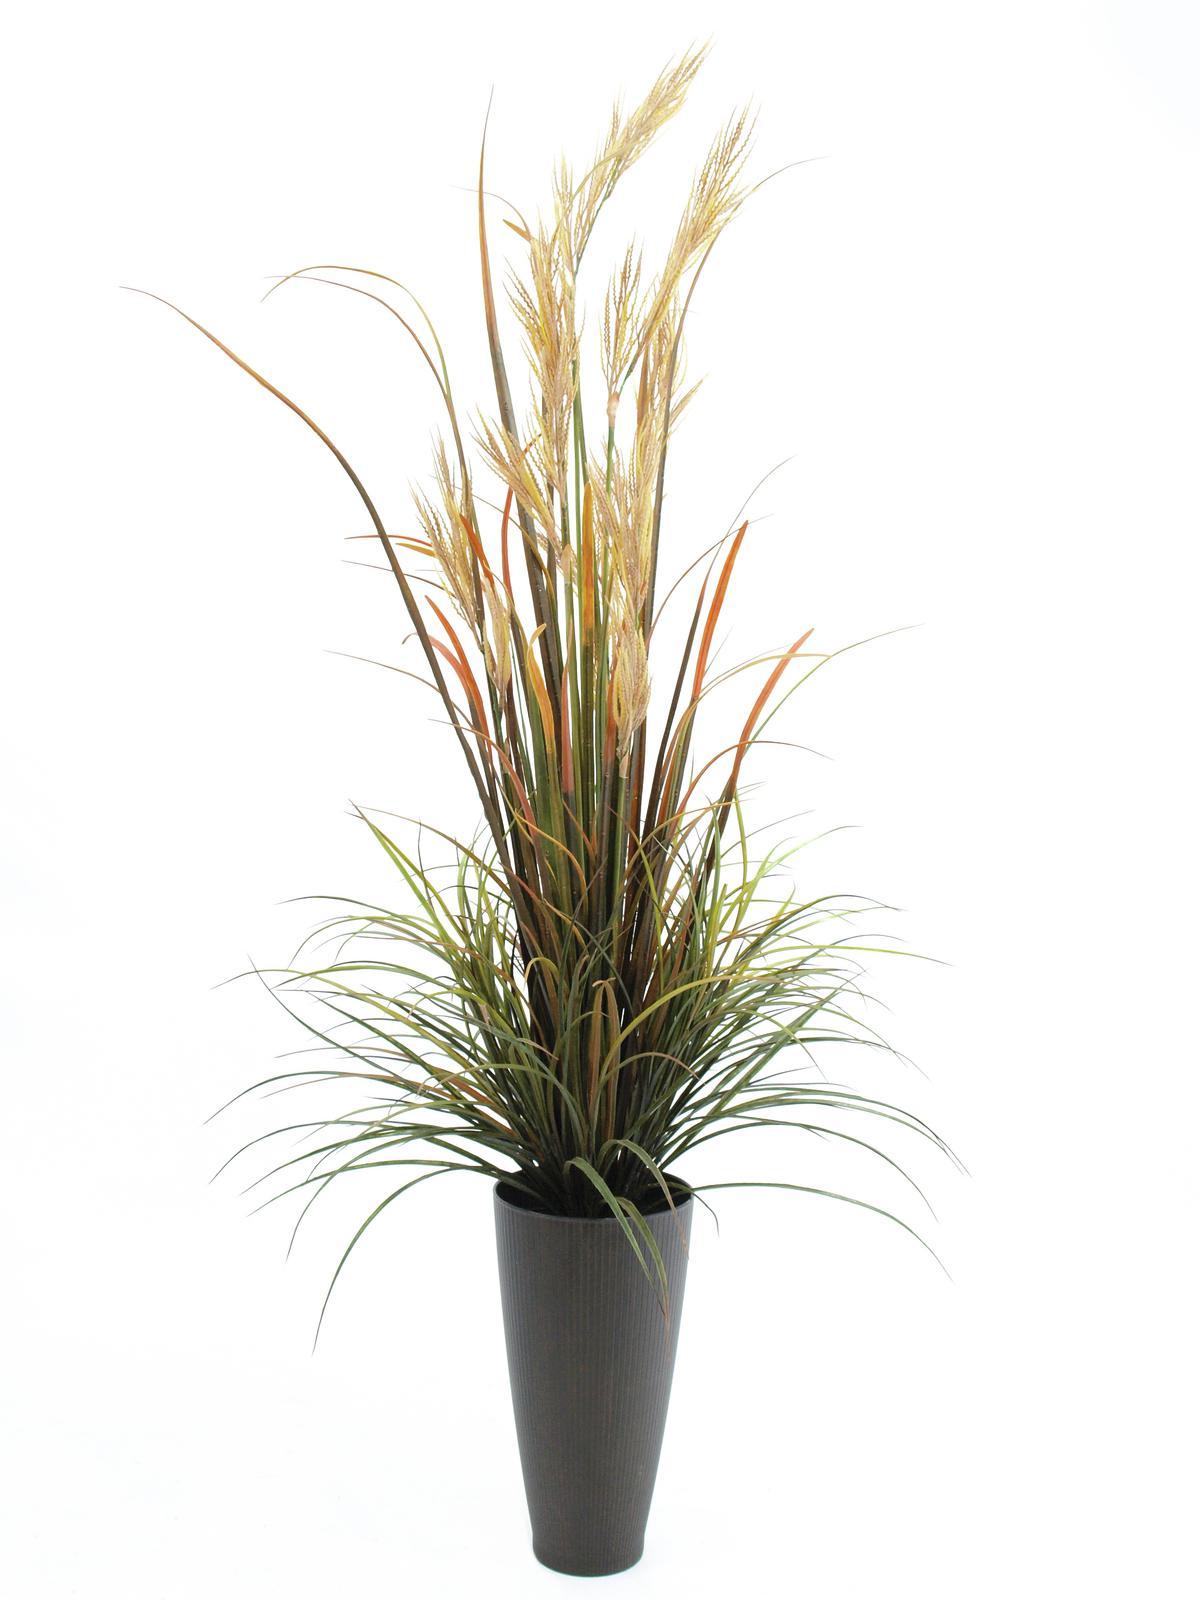 europalms-schilfgras-september-175cm-kunststoffpflanze